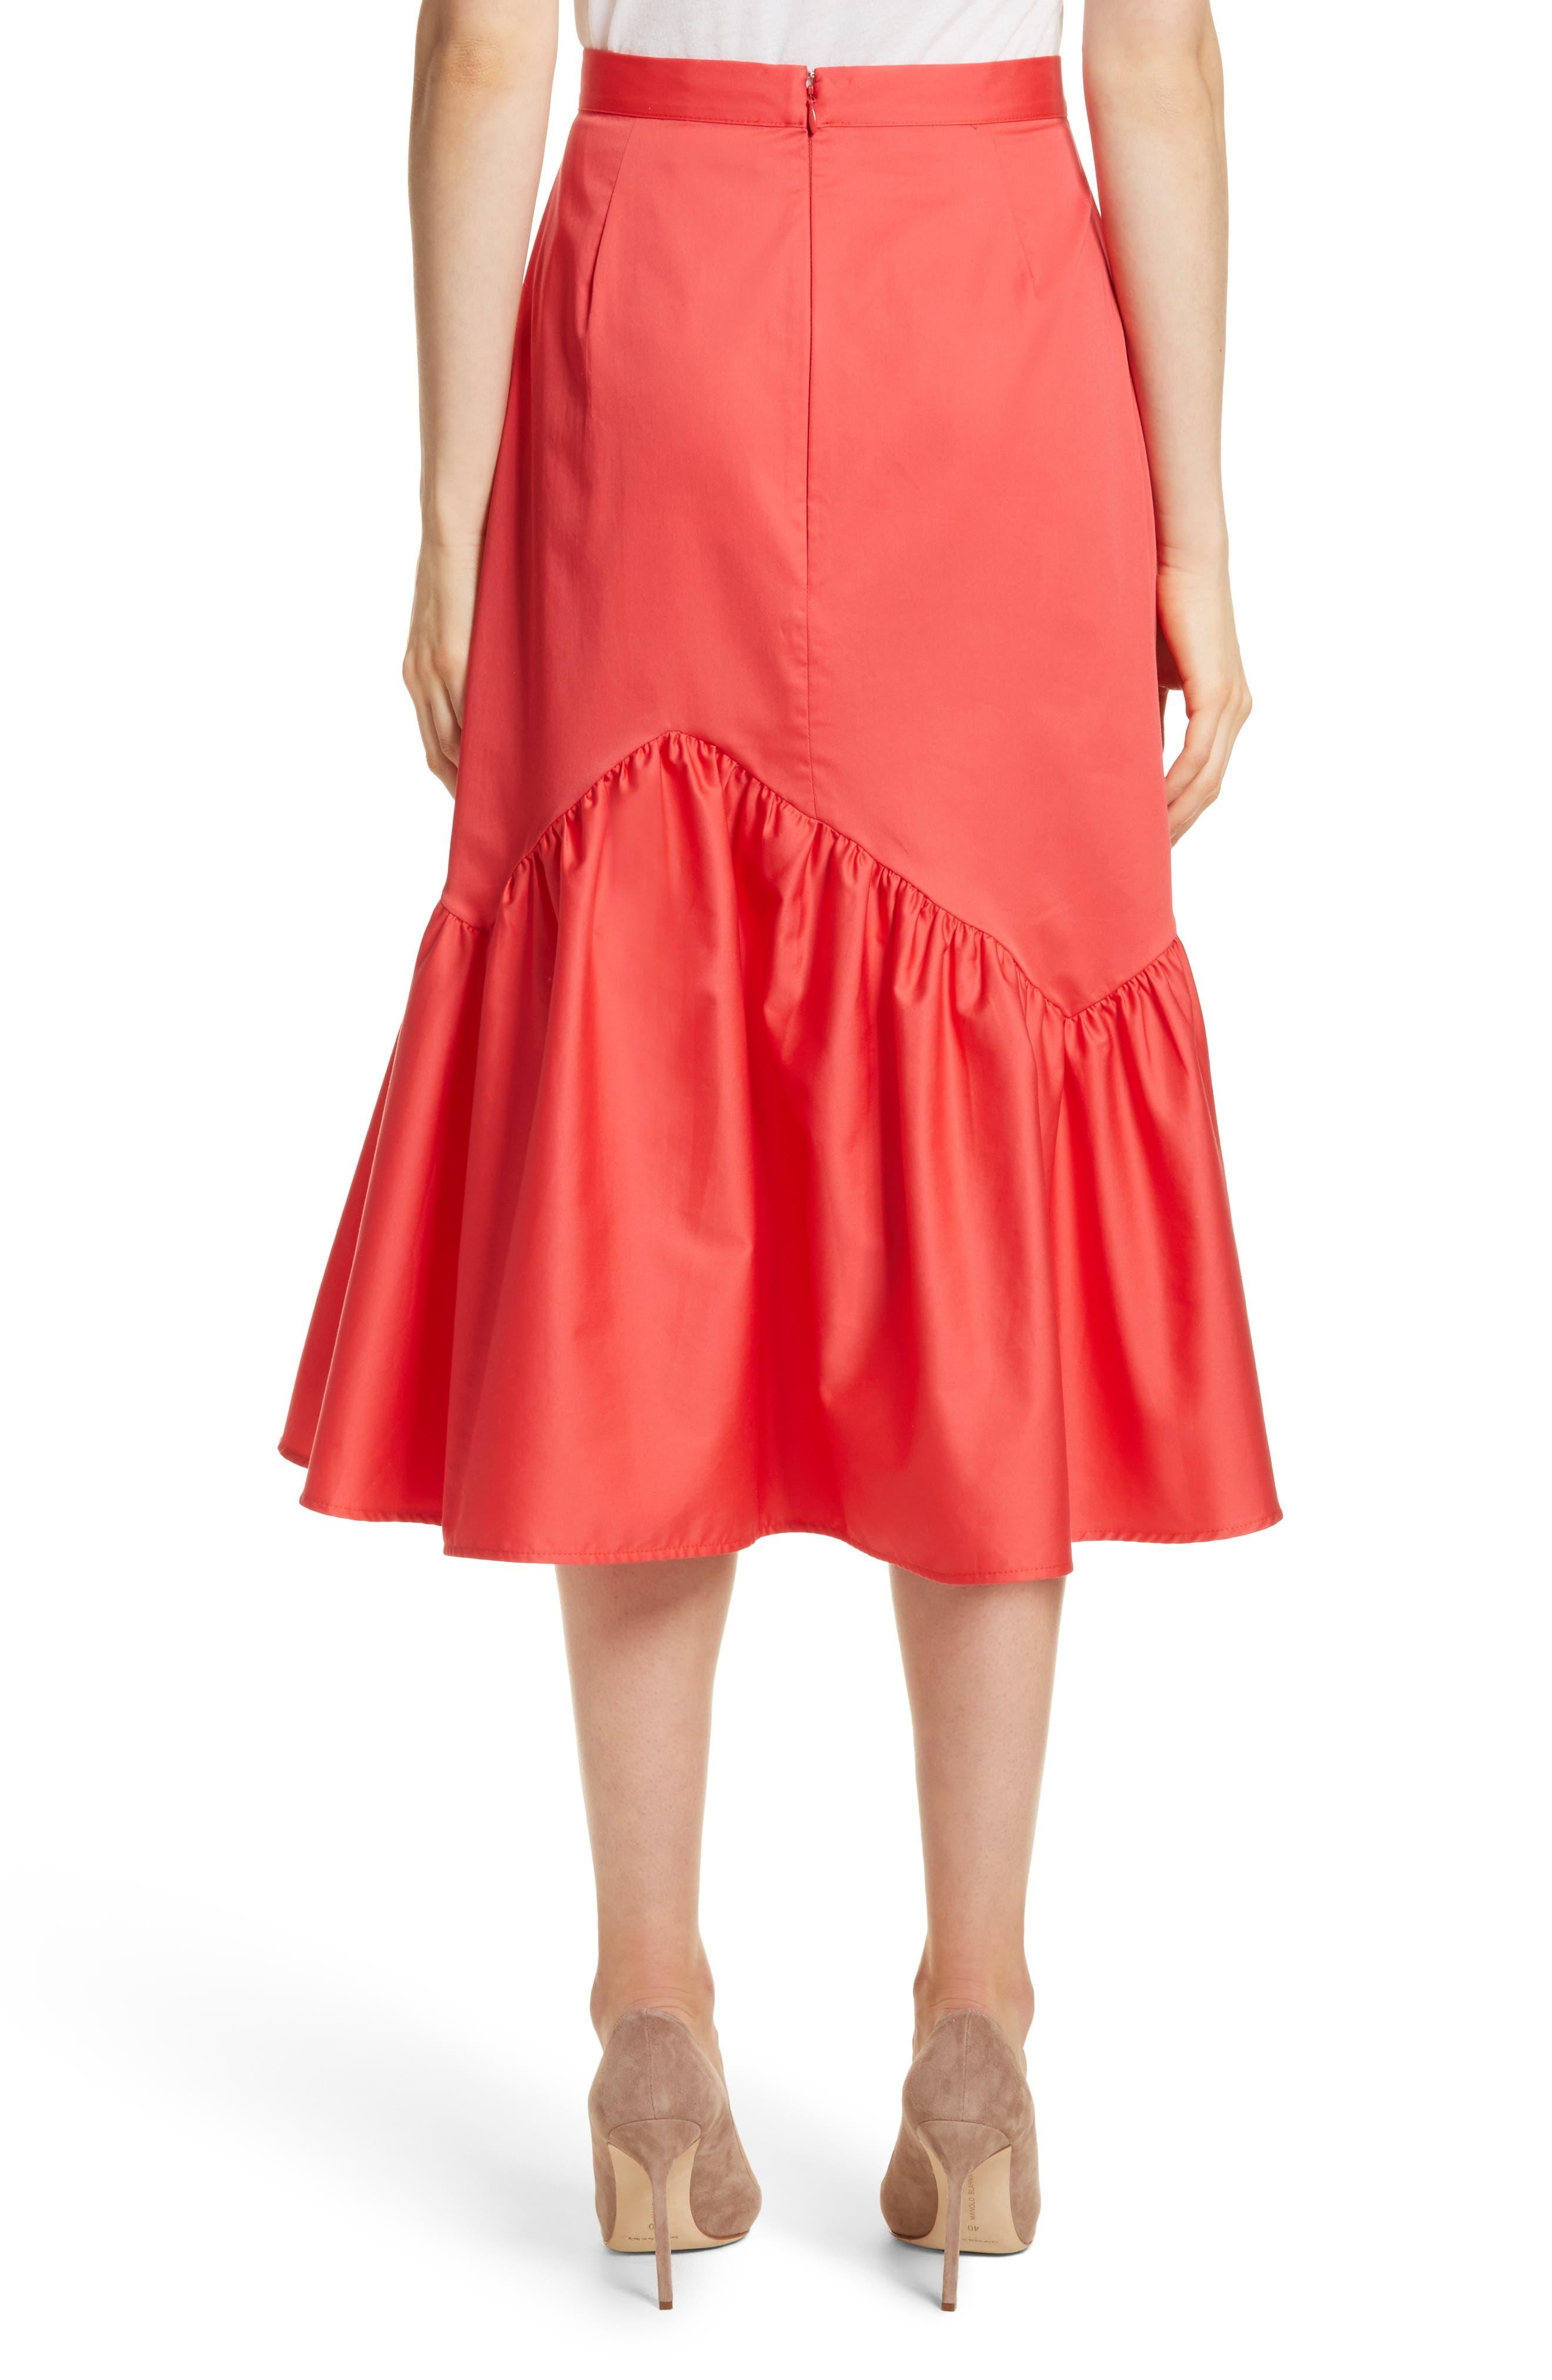 Prose & Poetry Tyra Midi Skirt,                             Alternate thumbnail 2, color,                             Watermelon